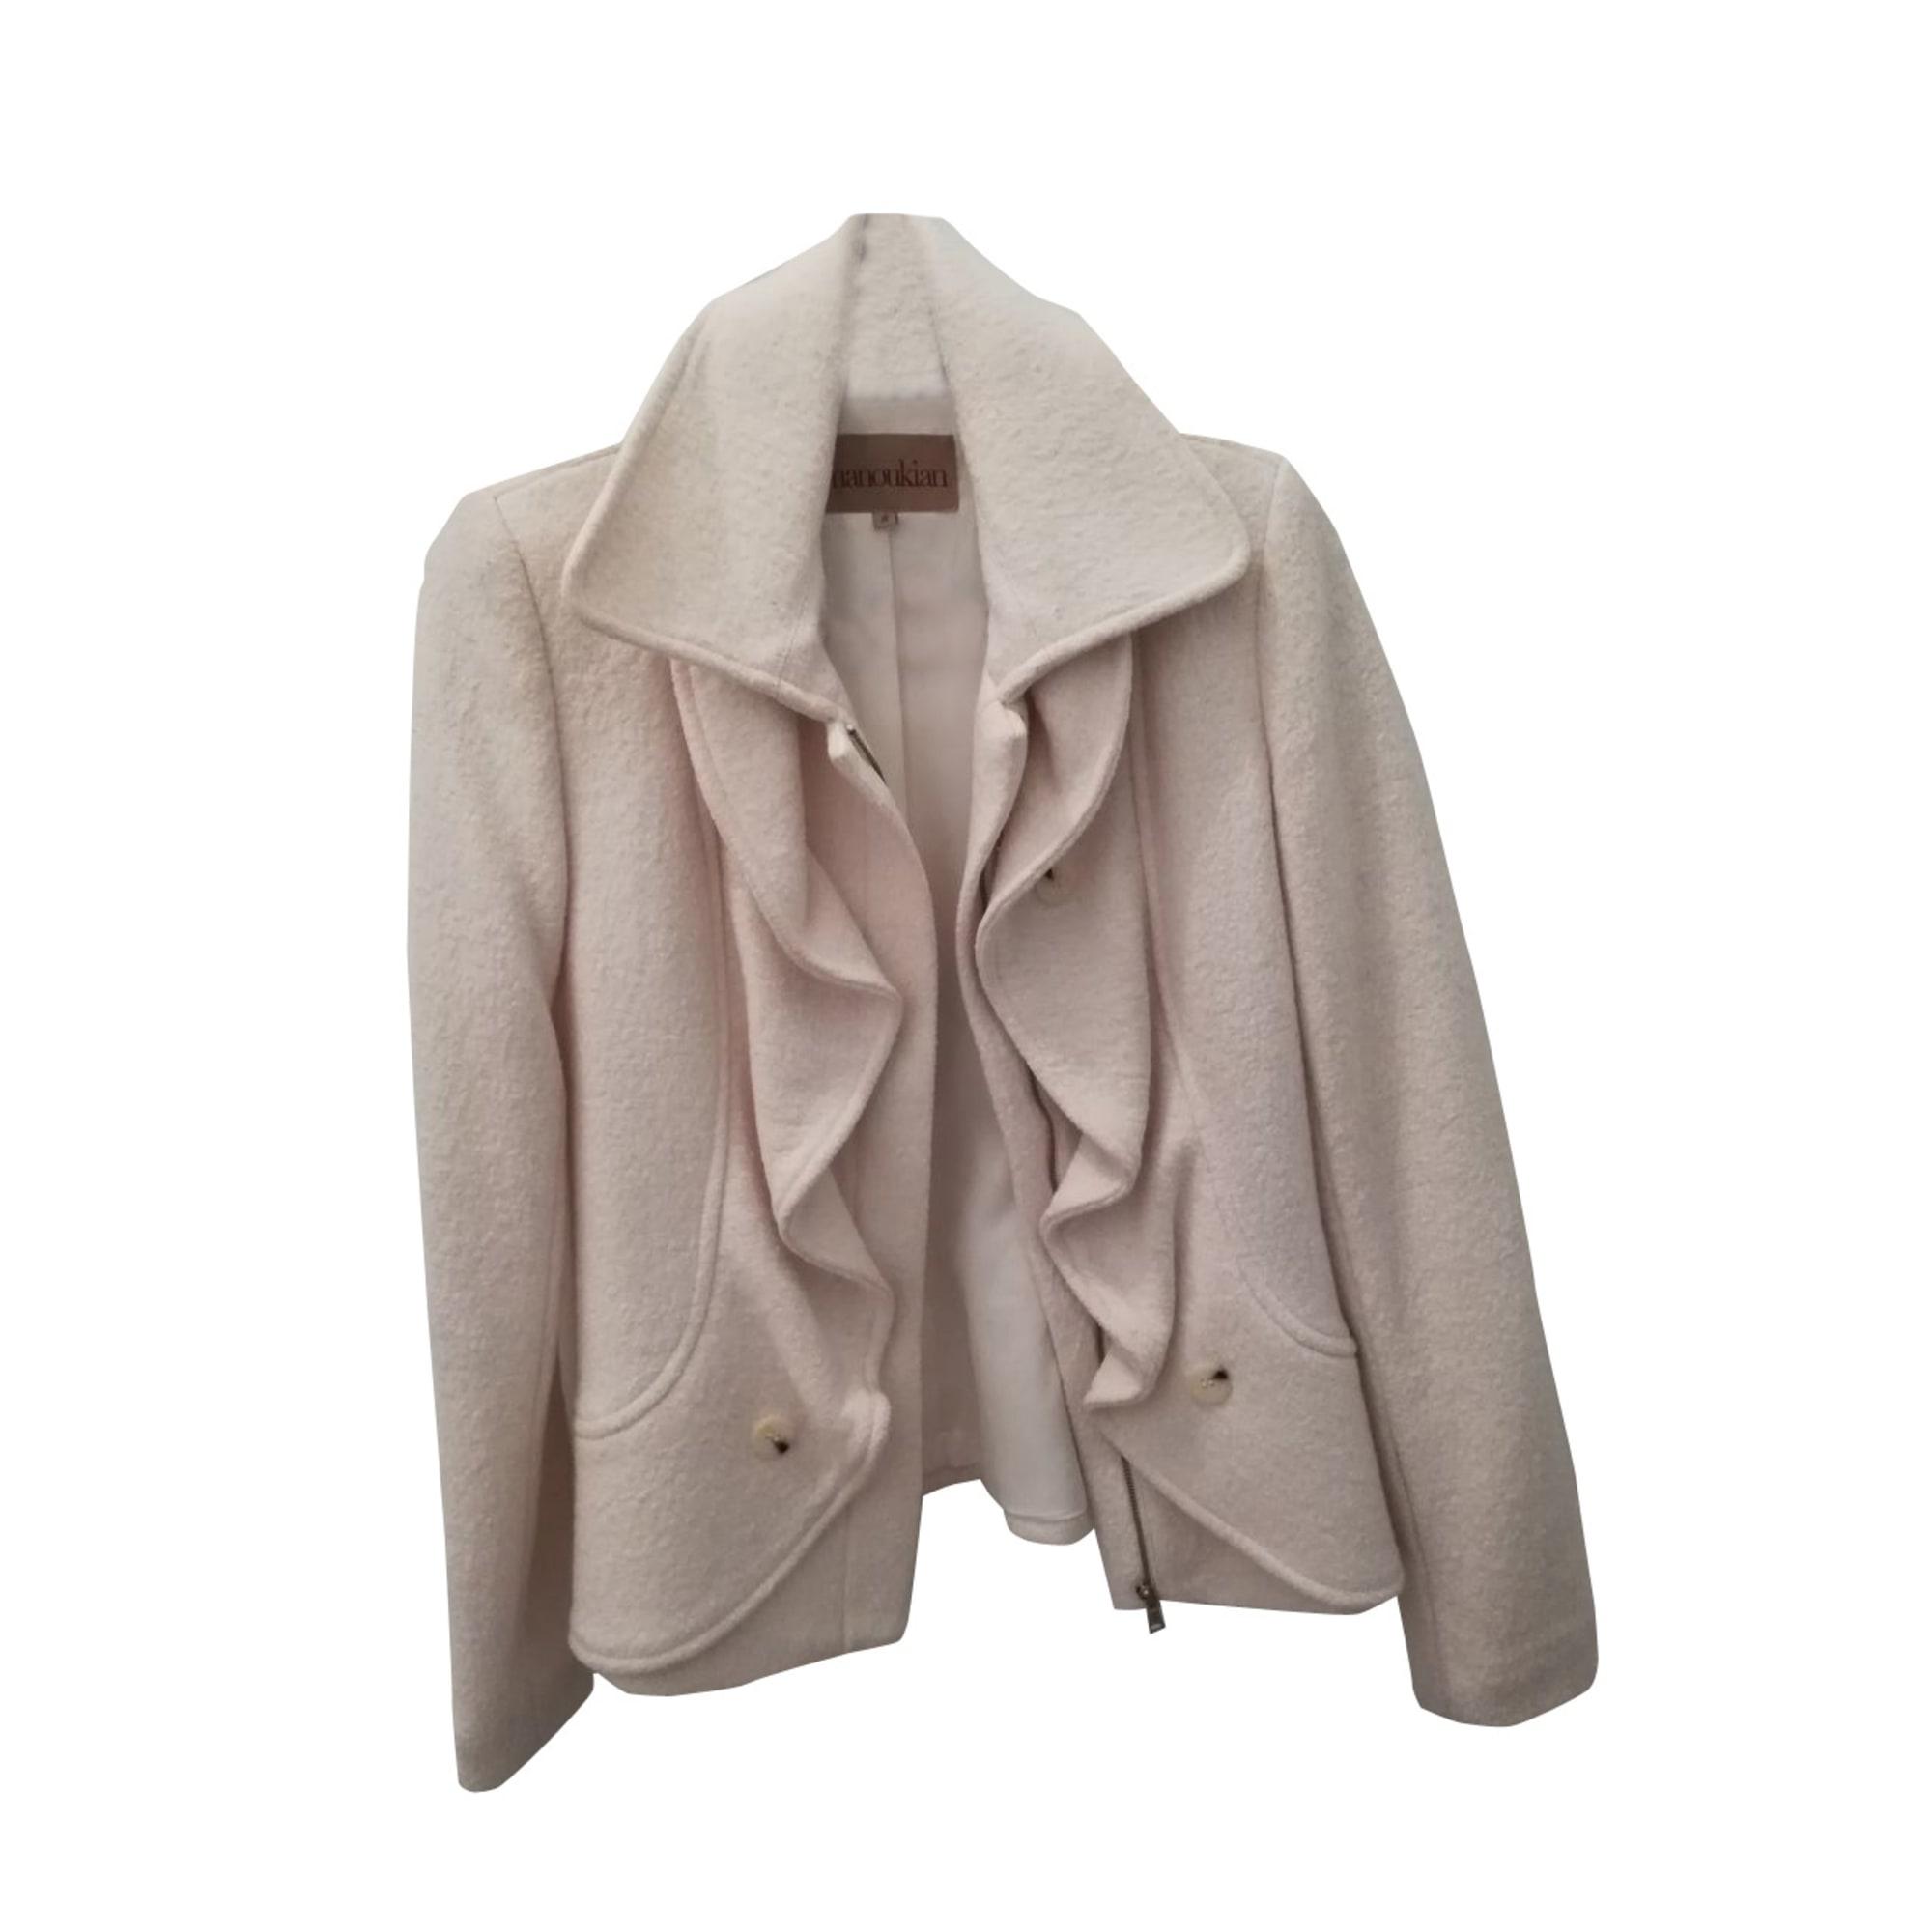 Manteau ALAIN MANOUKIAN 36 (S, T1) blanc 8190619